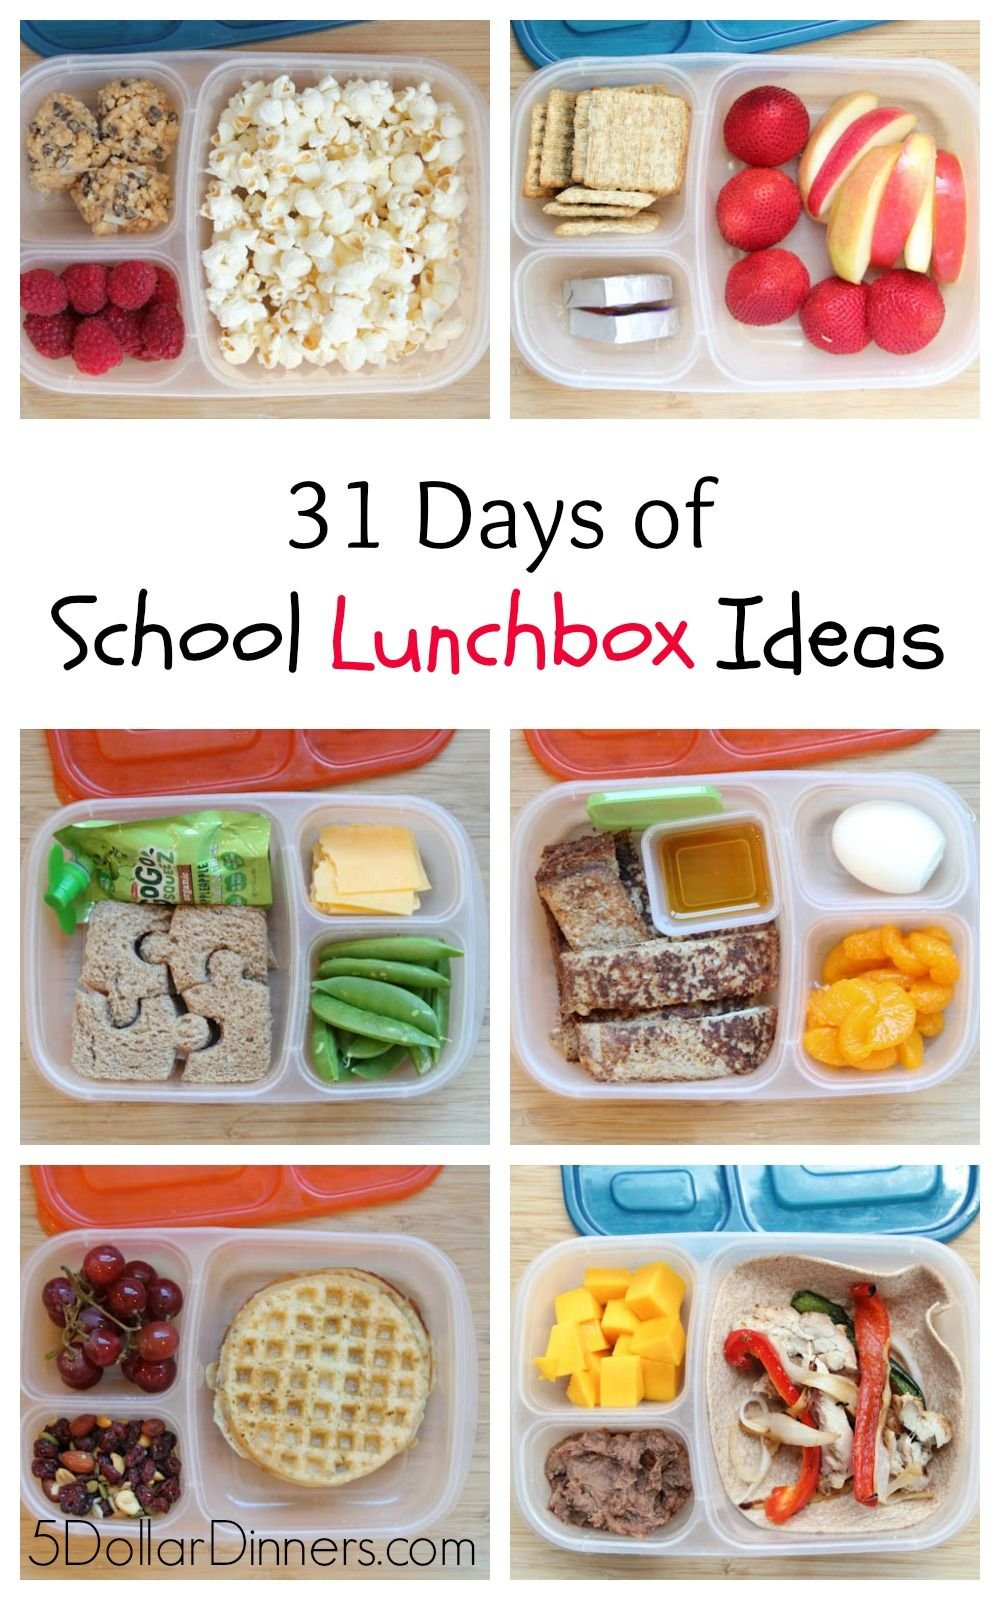 31 Days Of School Lunchbox Ideas | Здоровое Питание, Еда Image Box Of 31 Days